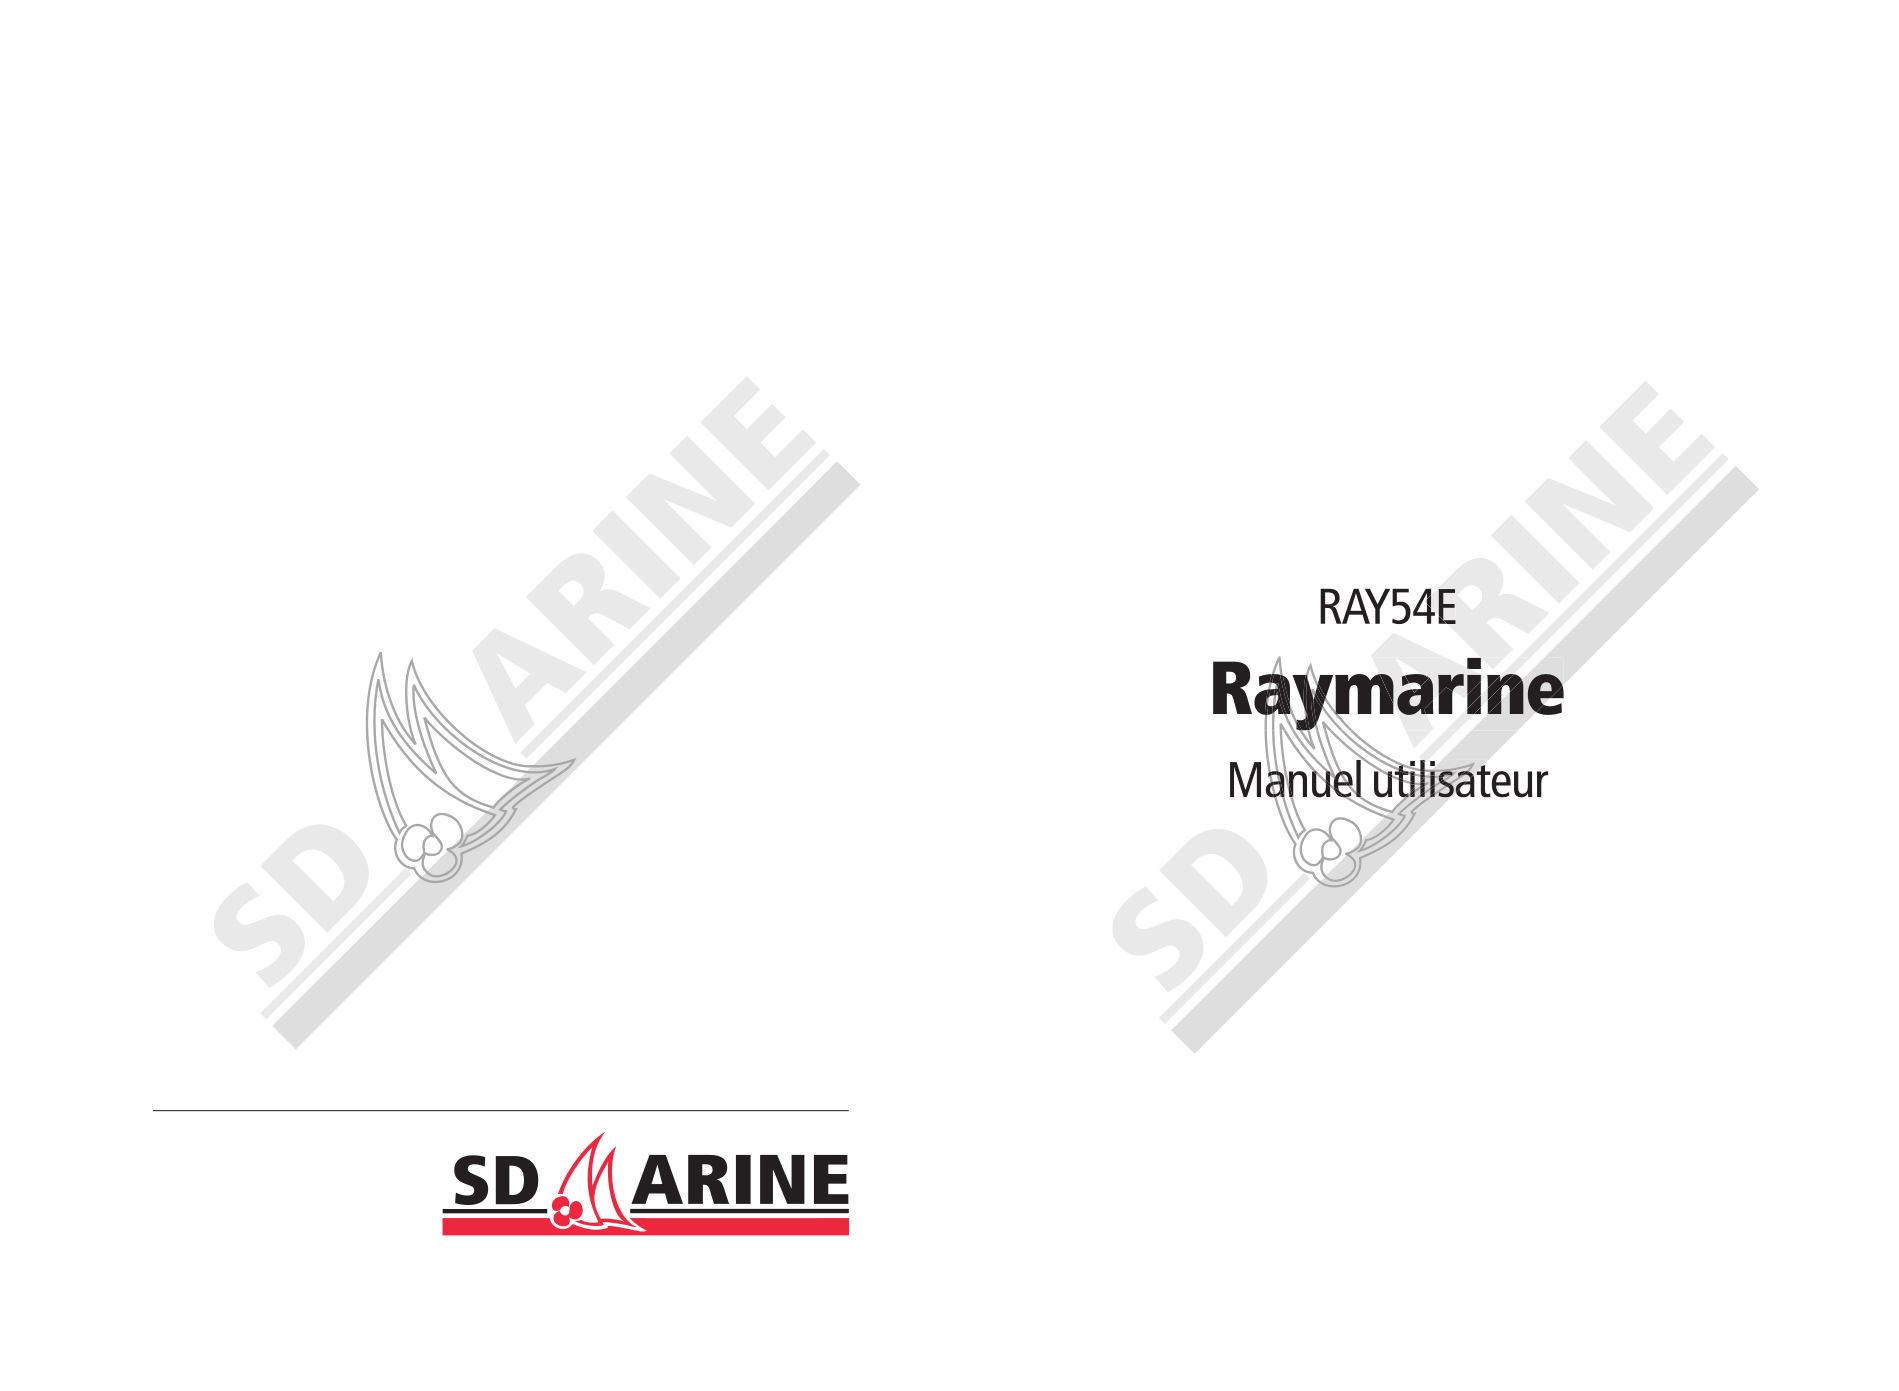 Download free pdf for Raymarine Ray54E Radio manual